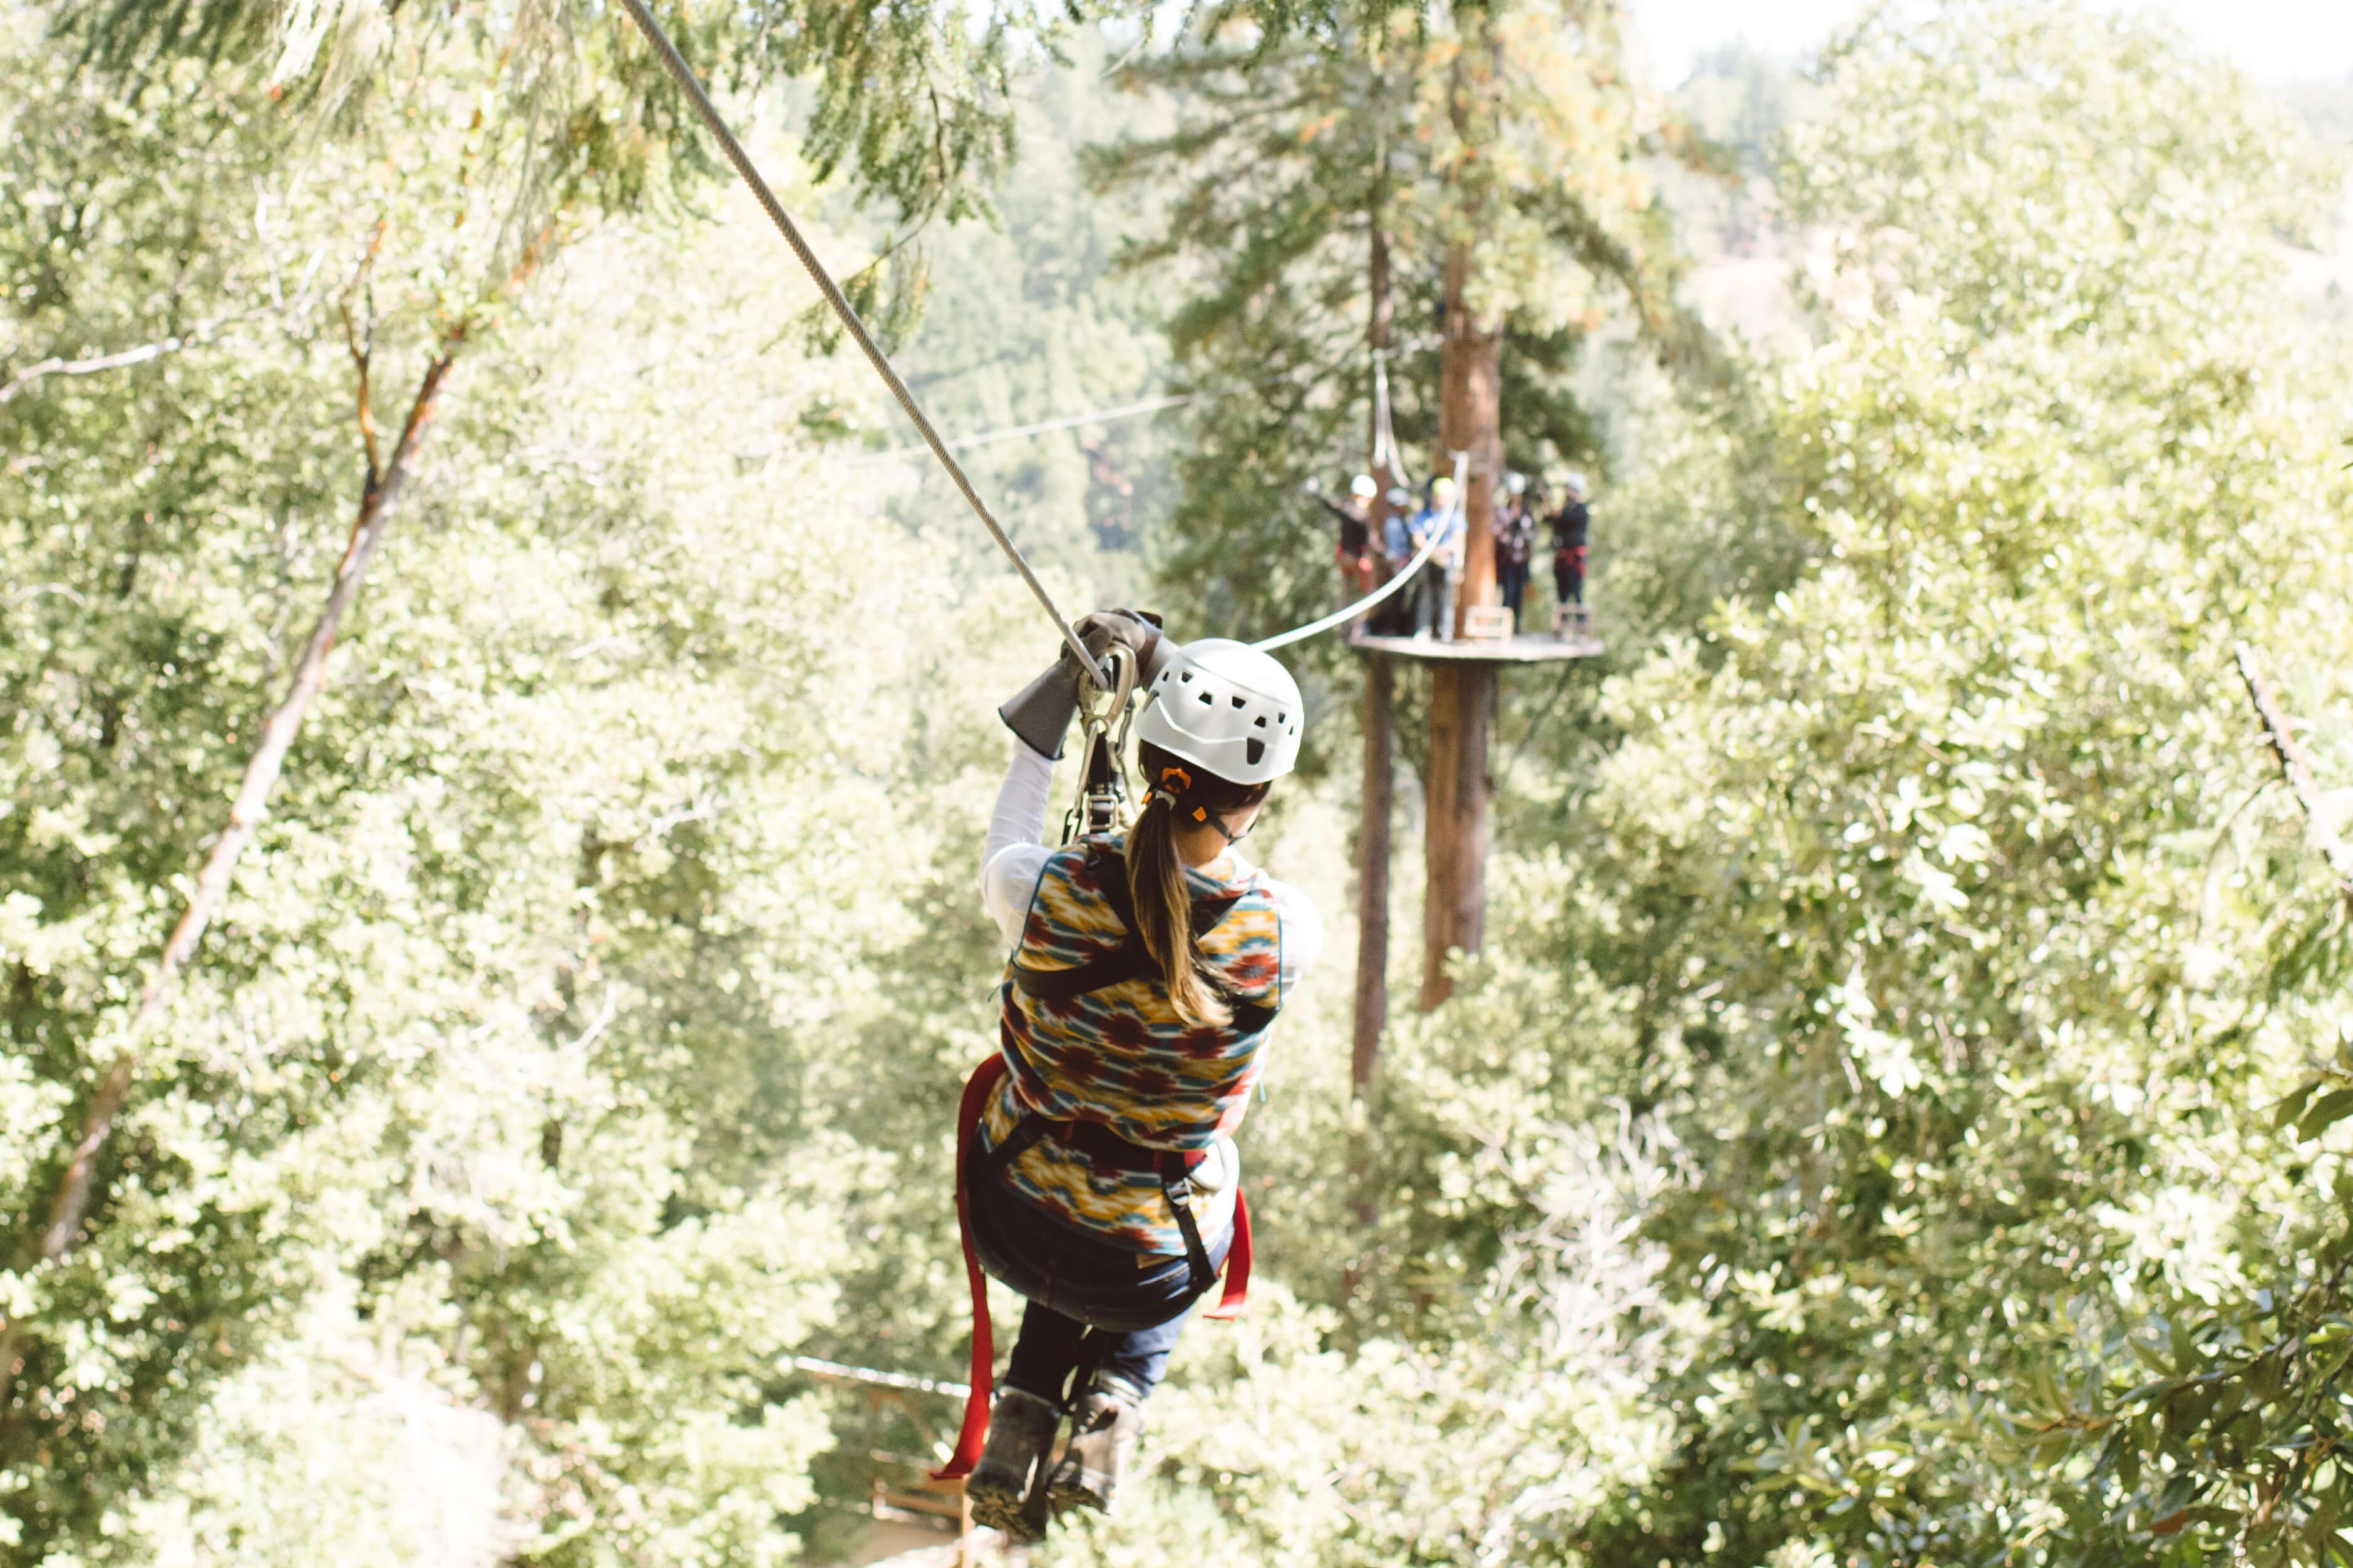 Sonoma Canopy Tour Zip Line in California